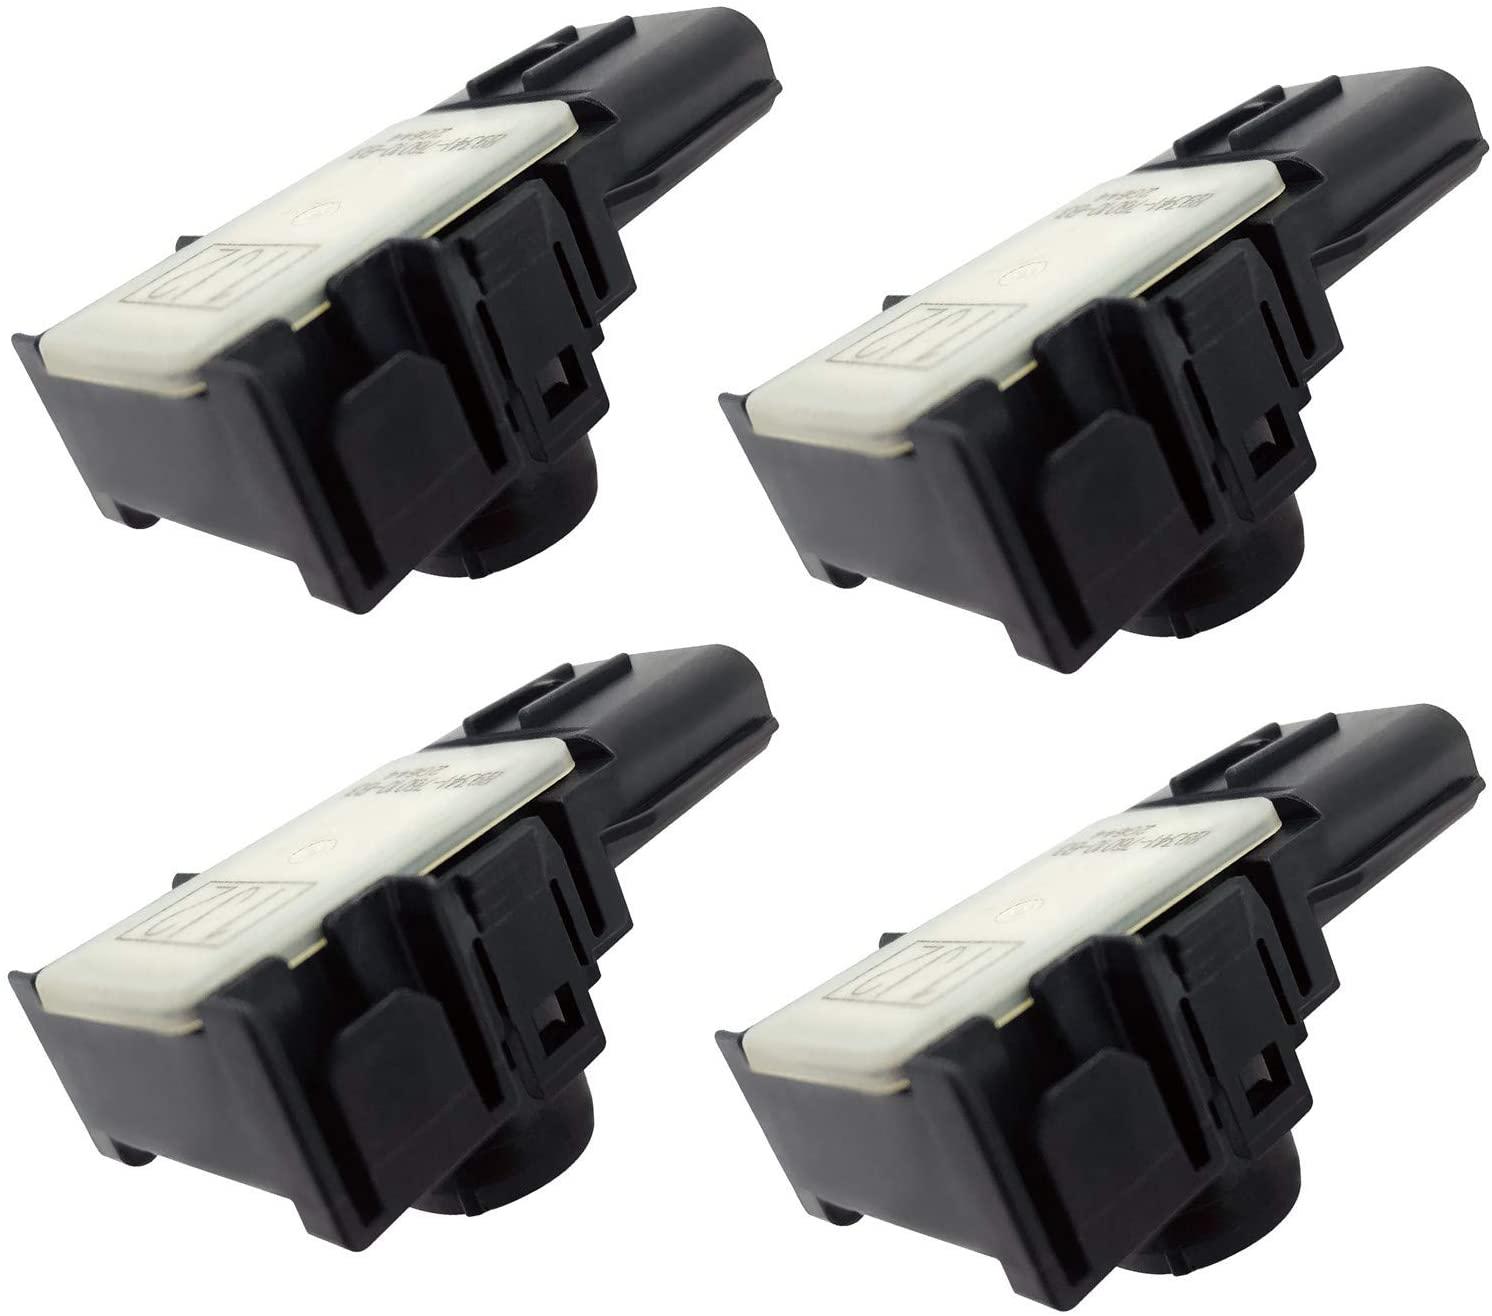 4 Pcs GzYcsFocusqp Ultrasonic Parking Sensor Reversing Radar Compatible for Lexus CT200H GS450 GS350 89341-76010-B3 89341-76010-A0